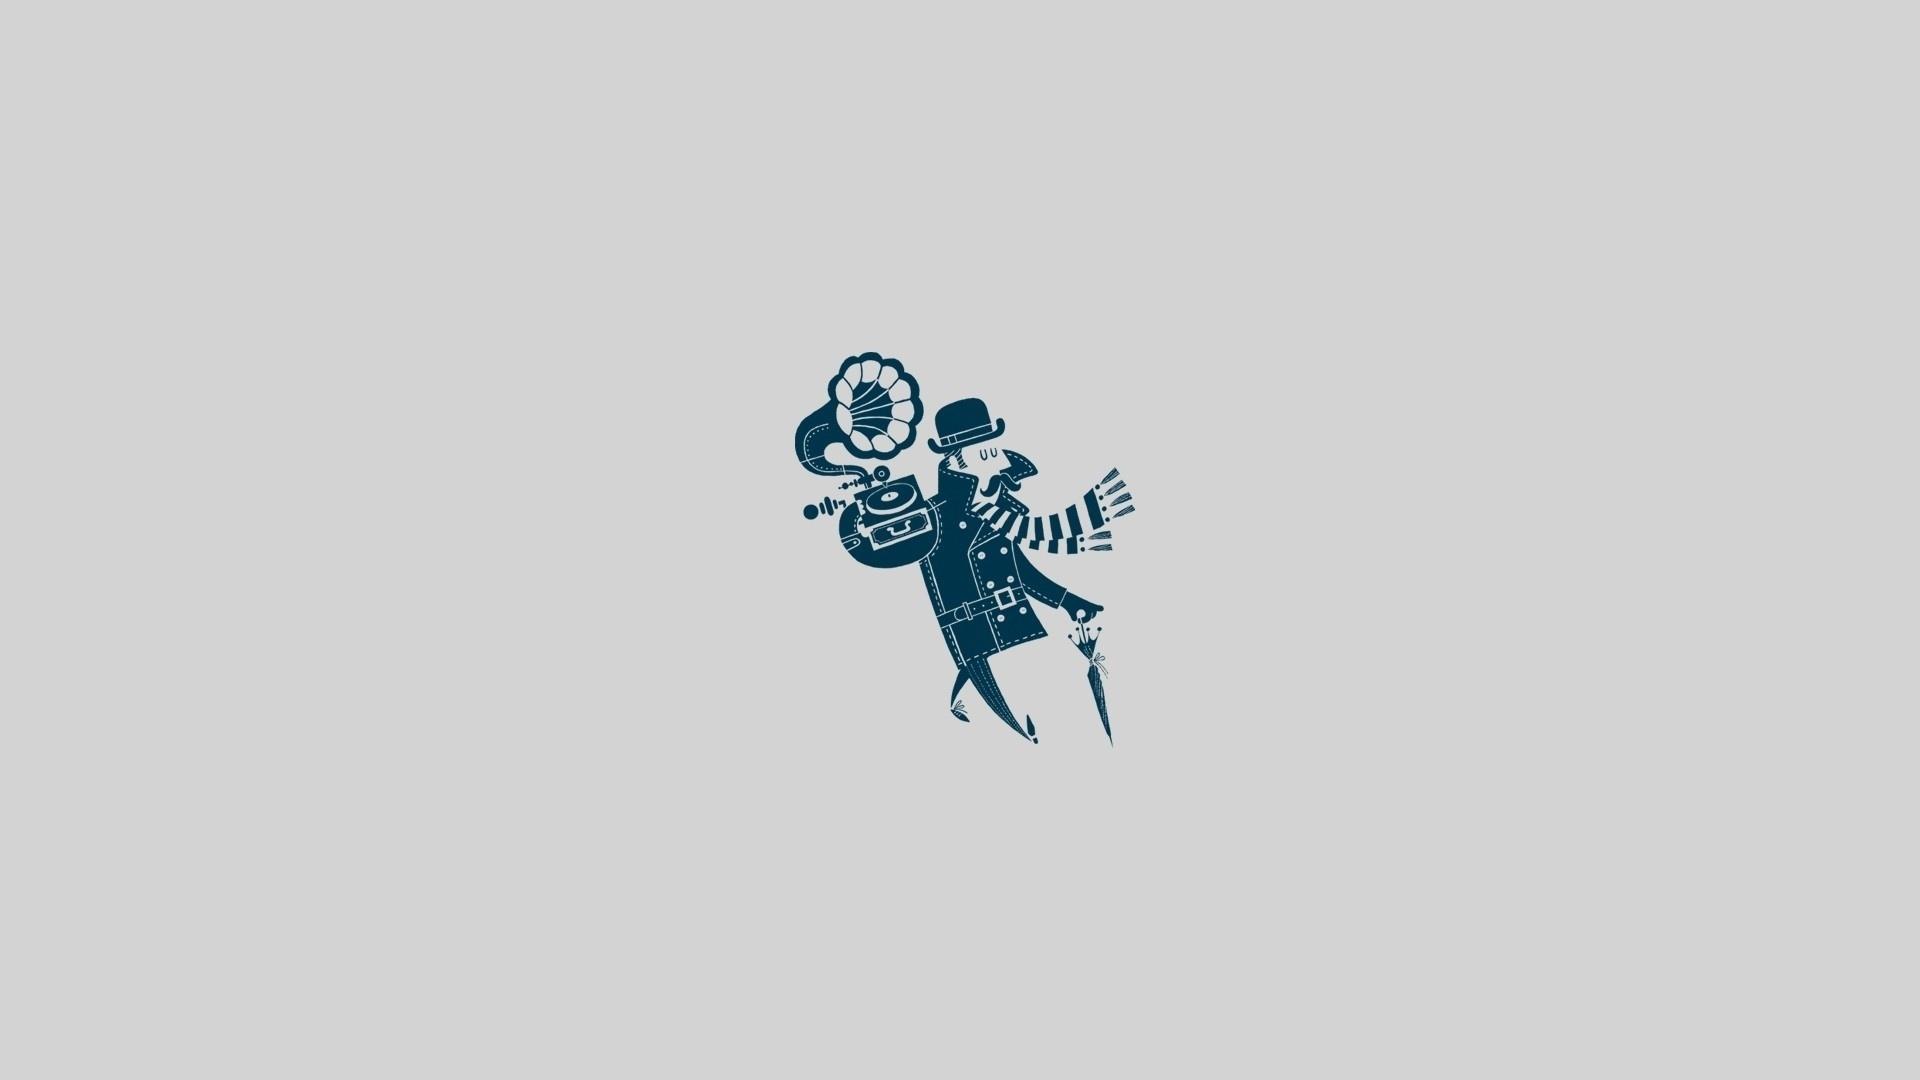 Moose Cute Minimalist Wallpaper Abstract Minimalist Wallpapers Pixelstalk Net